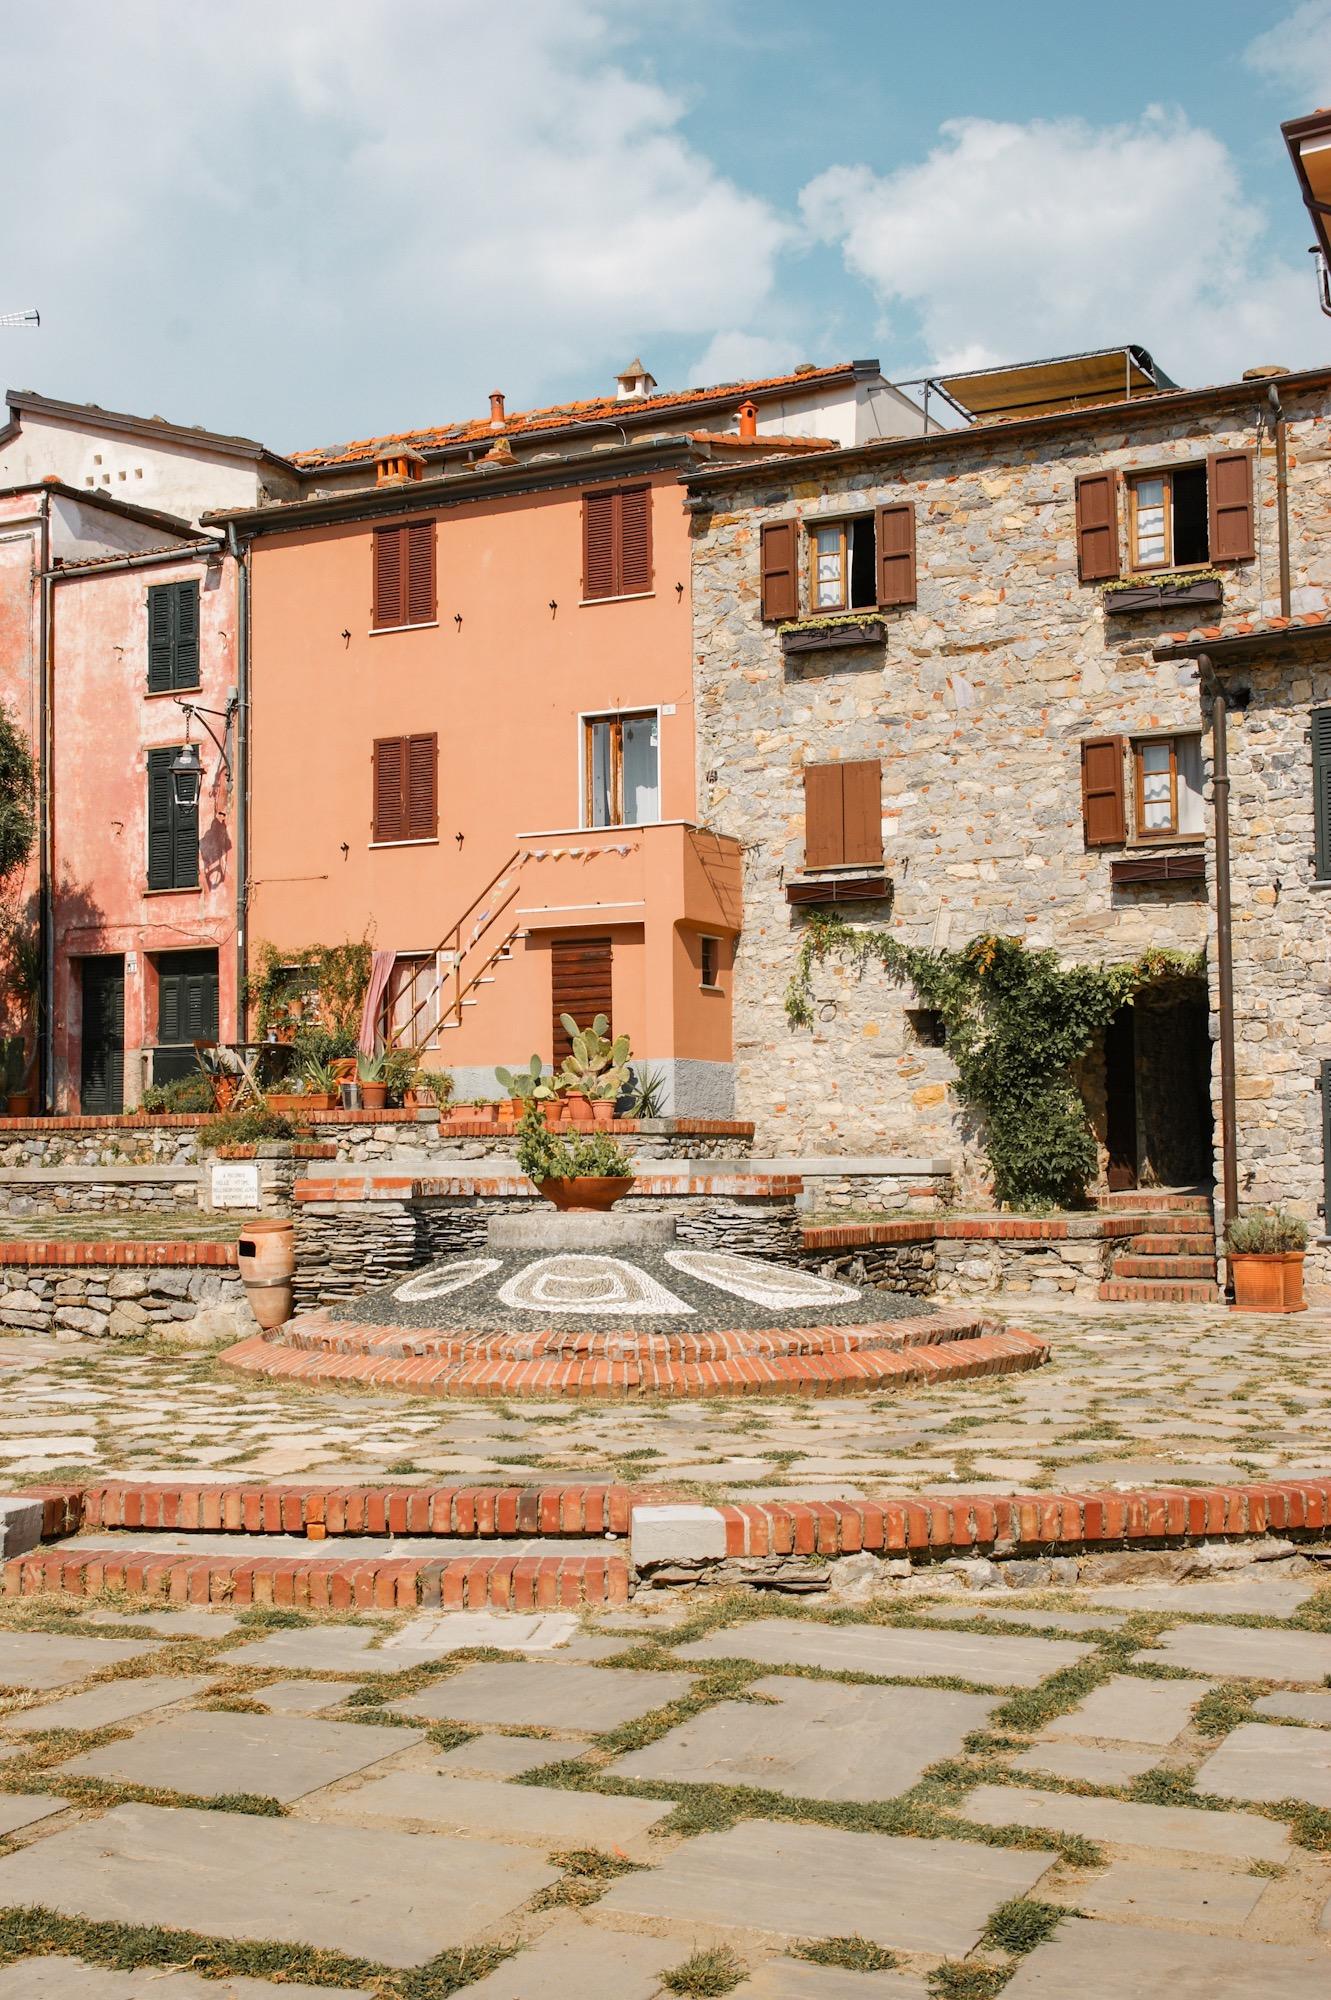 Montemarcello, Reisebeitrag, Italien, Ligurien, Bergdorf